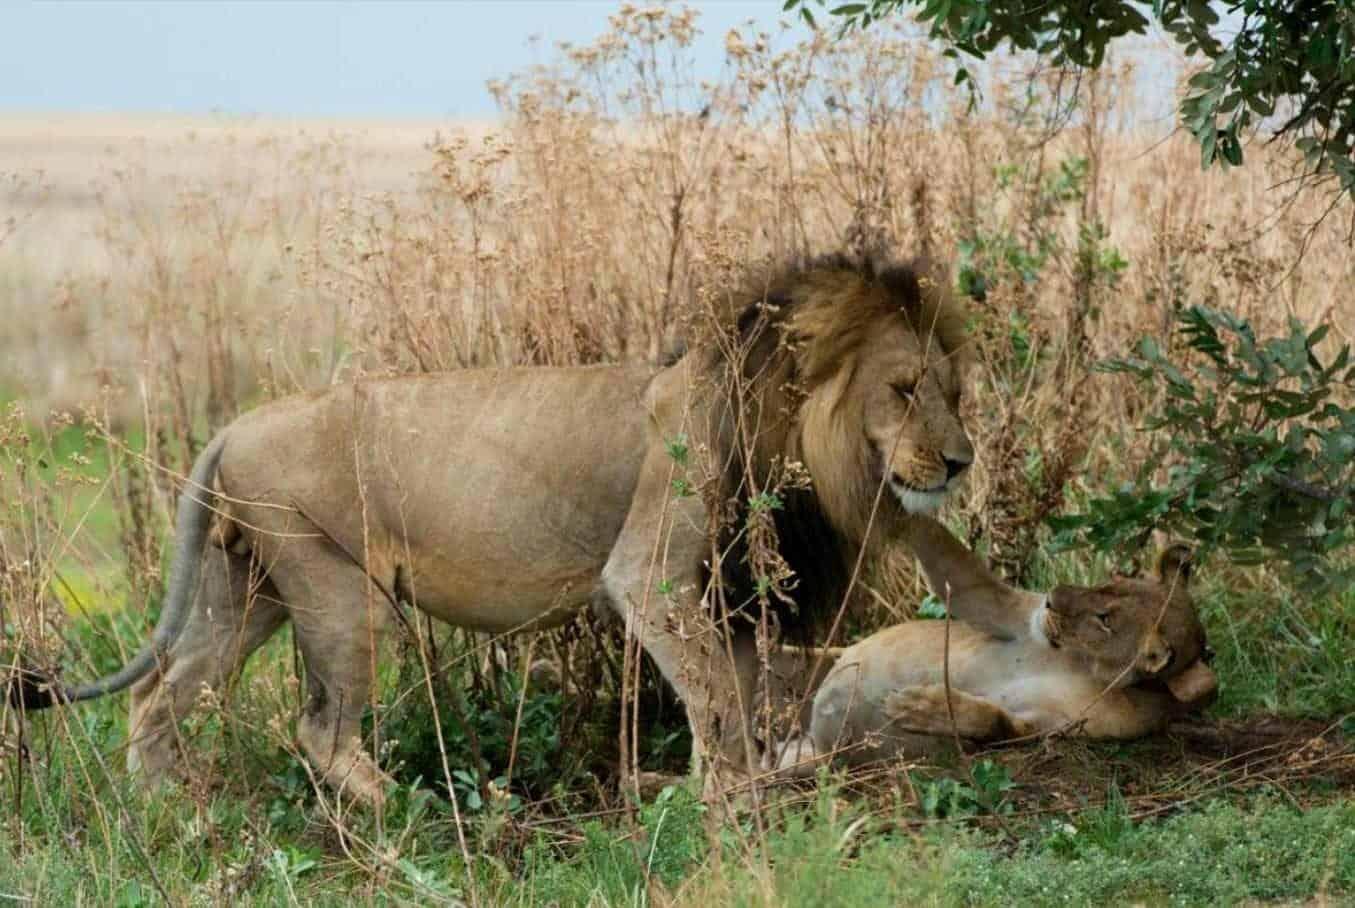 Lion Cubs Born in Liuwa Plain National Park in Zambia – A Major Milestone in Lion Restoration Programme